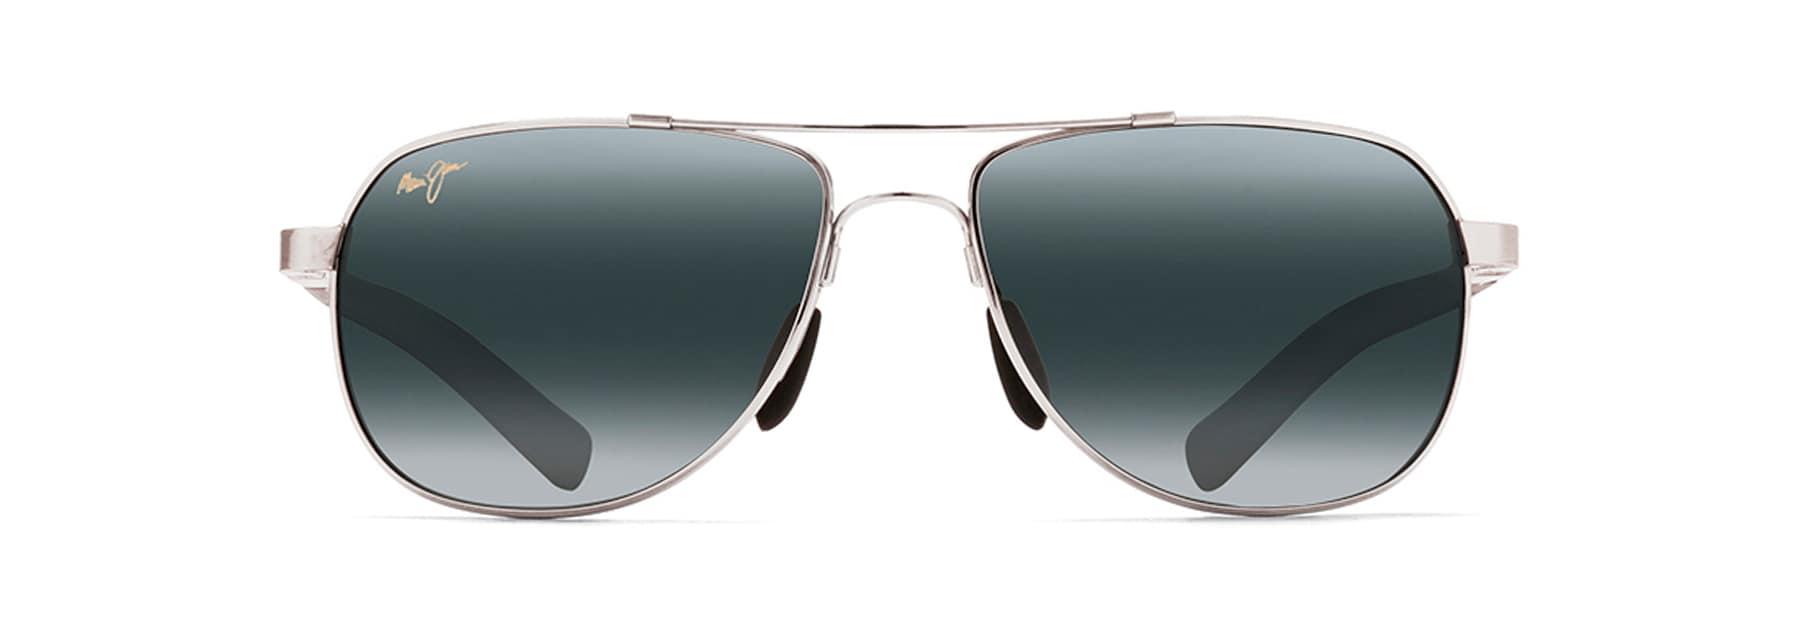 20b86711e8 Guardrails Polarised Sunglasses